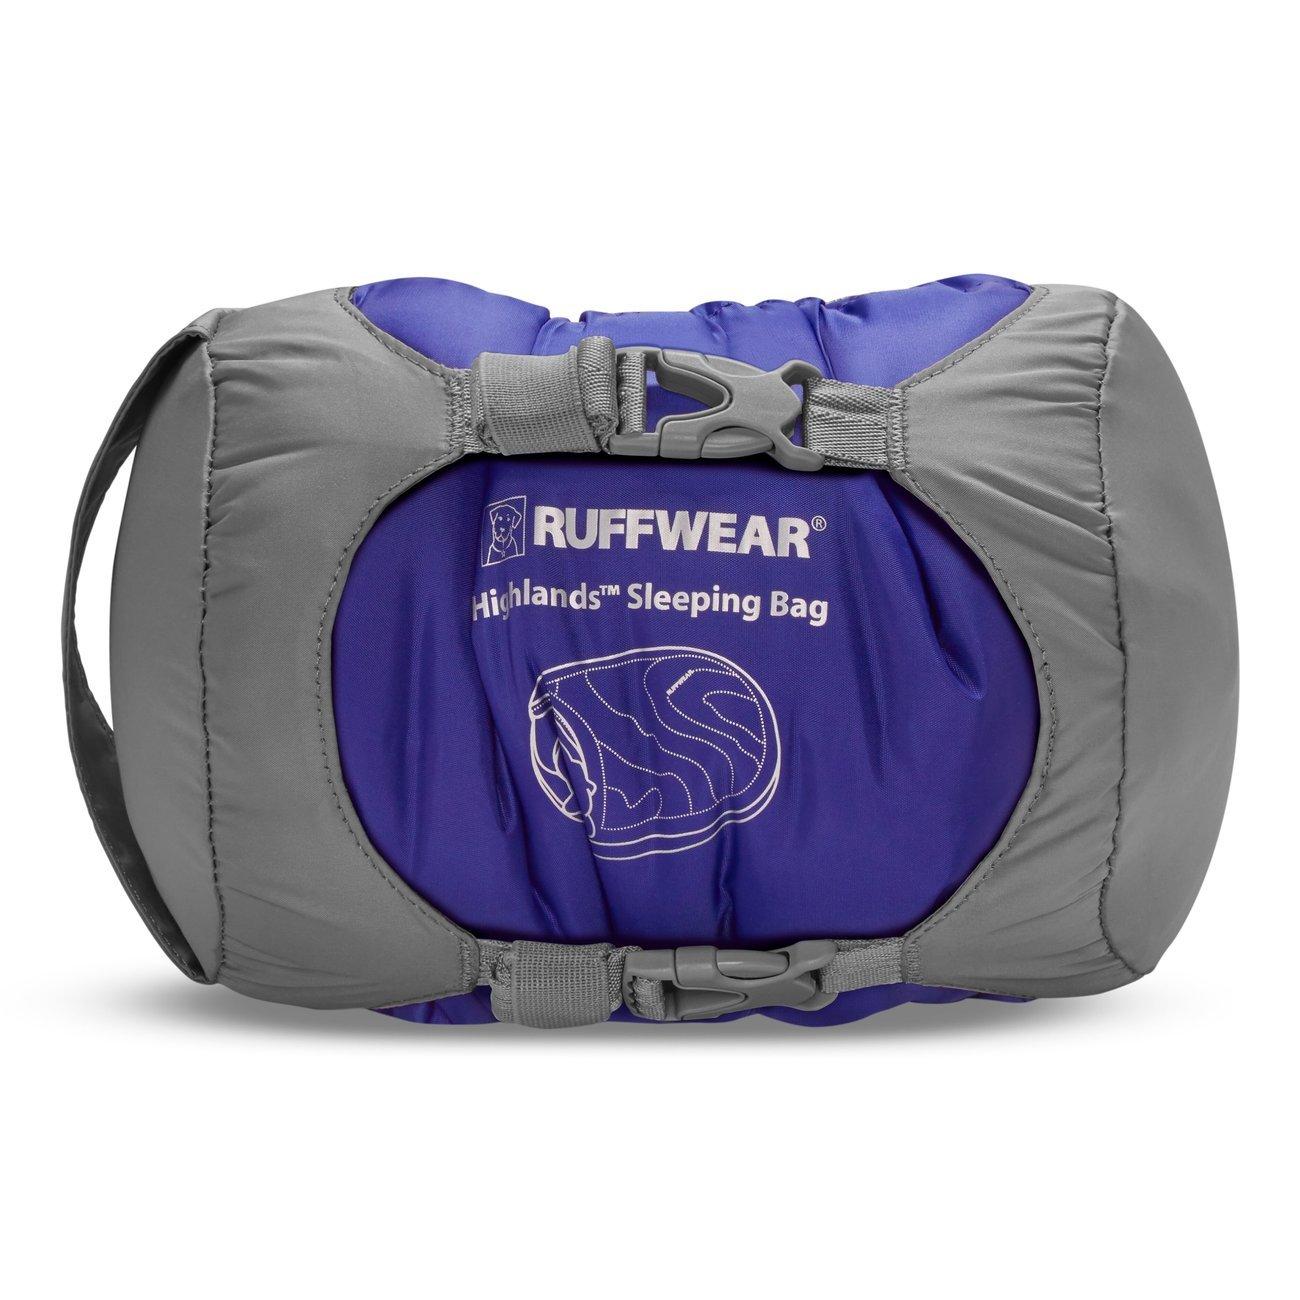 Ruffwear Highlands Sleeping Bag™ Schlafsack für Hunde, Bild 17